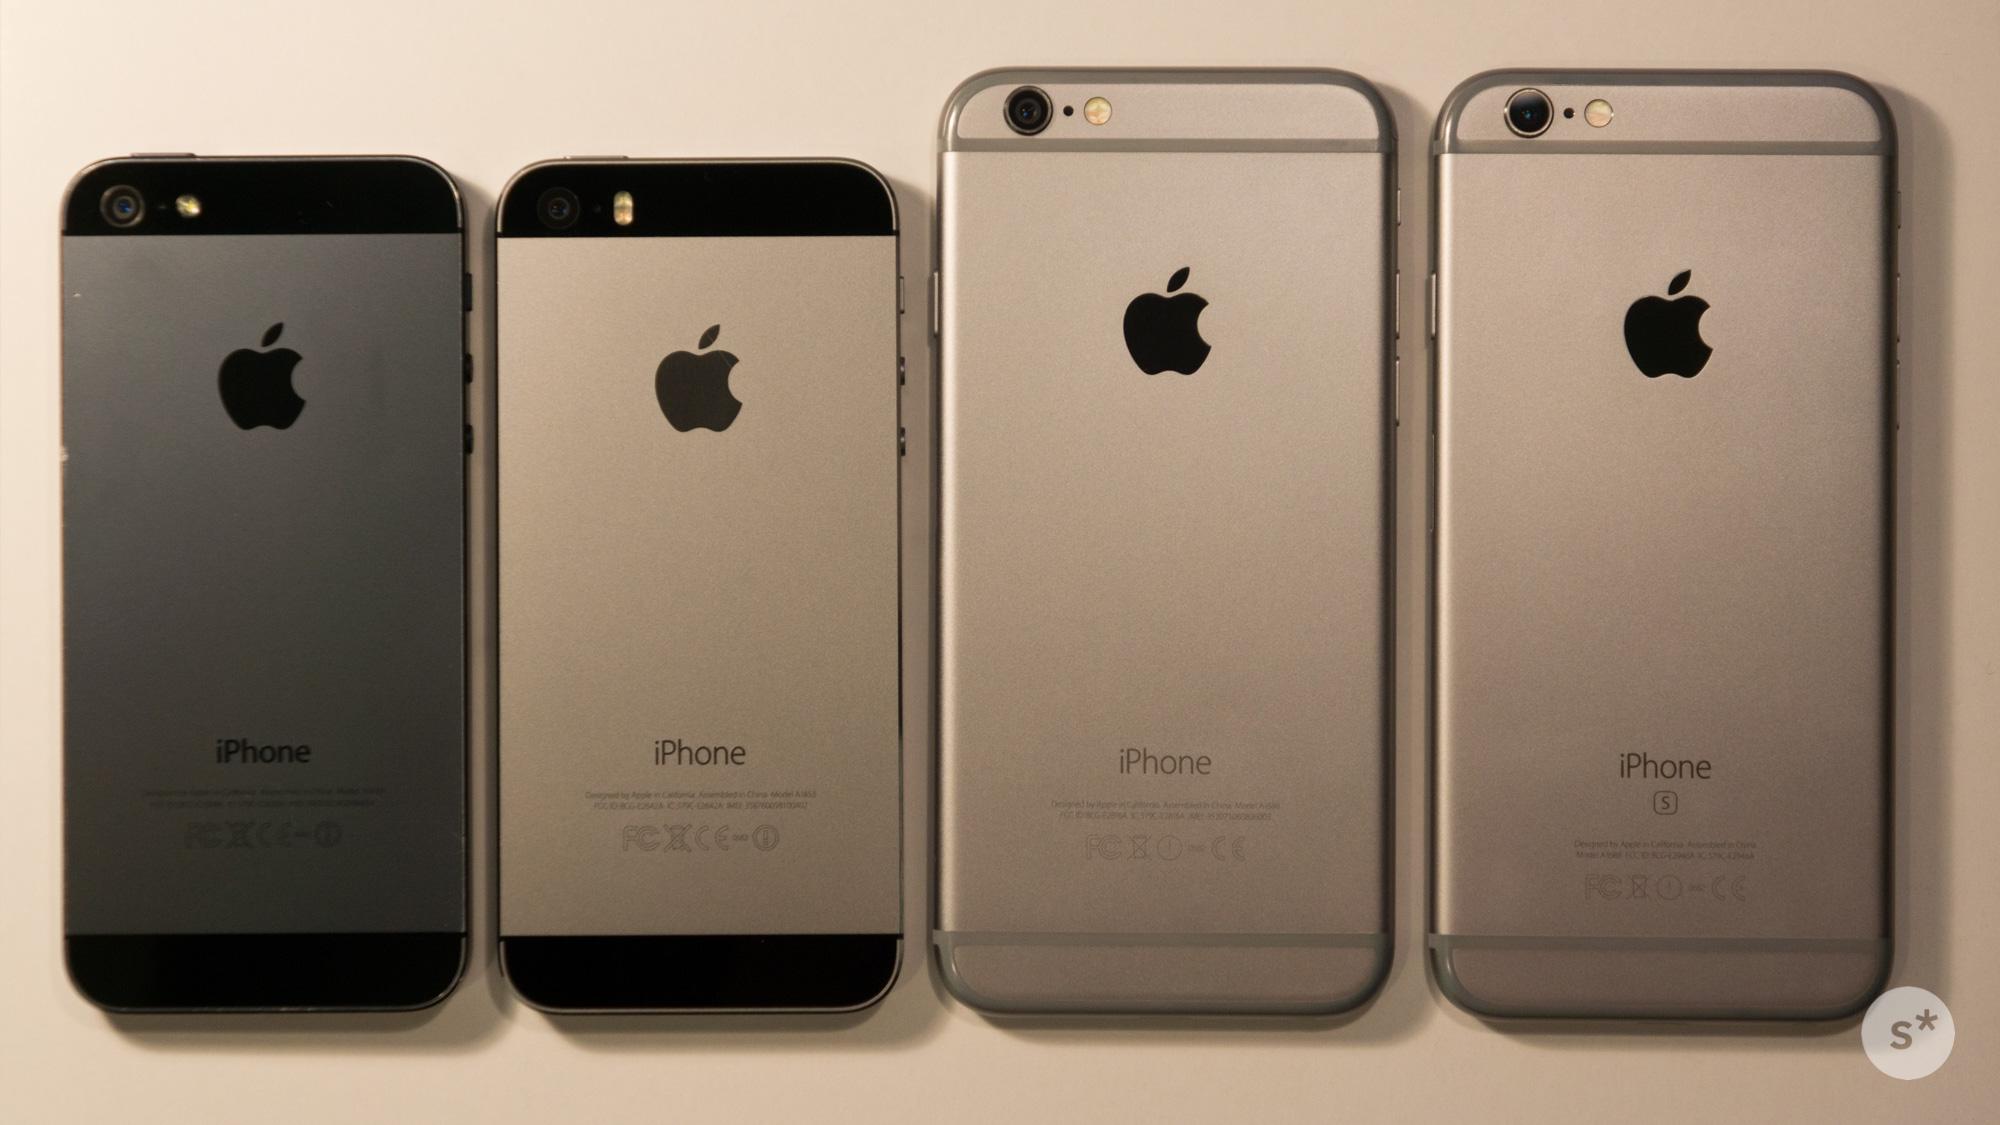 iphone5-6s